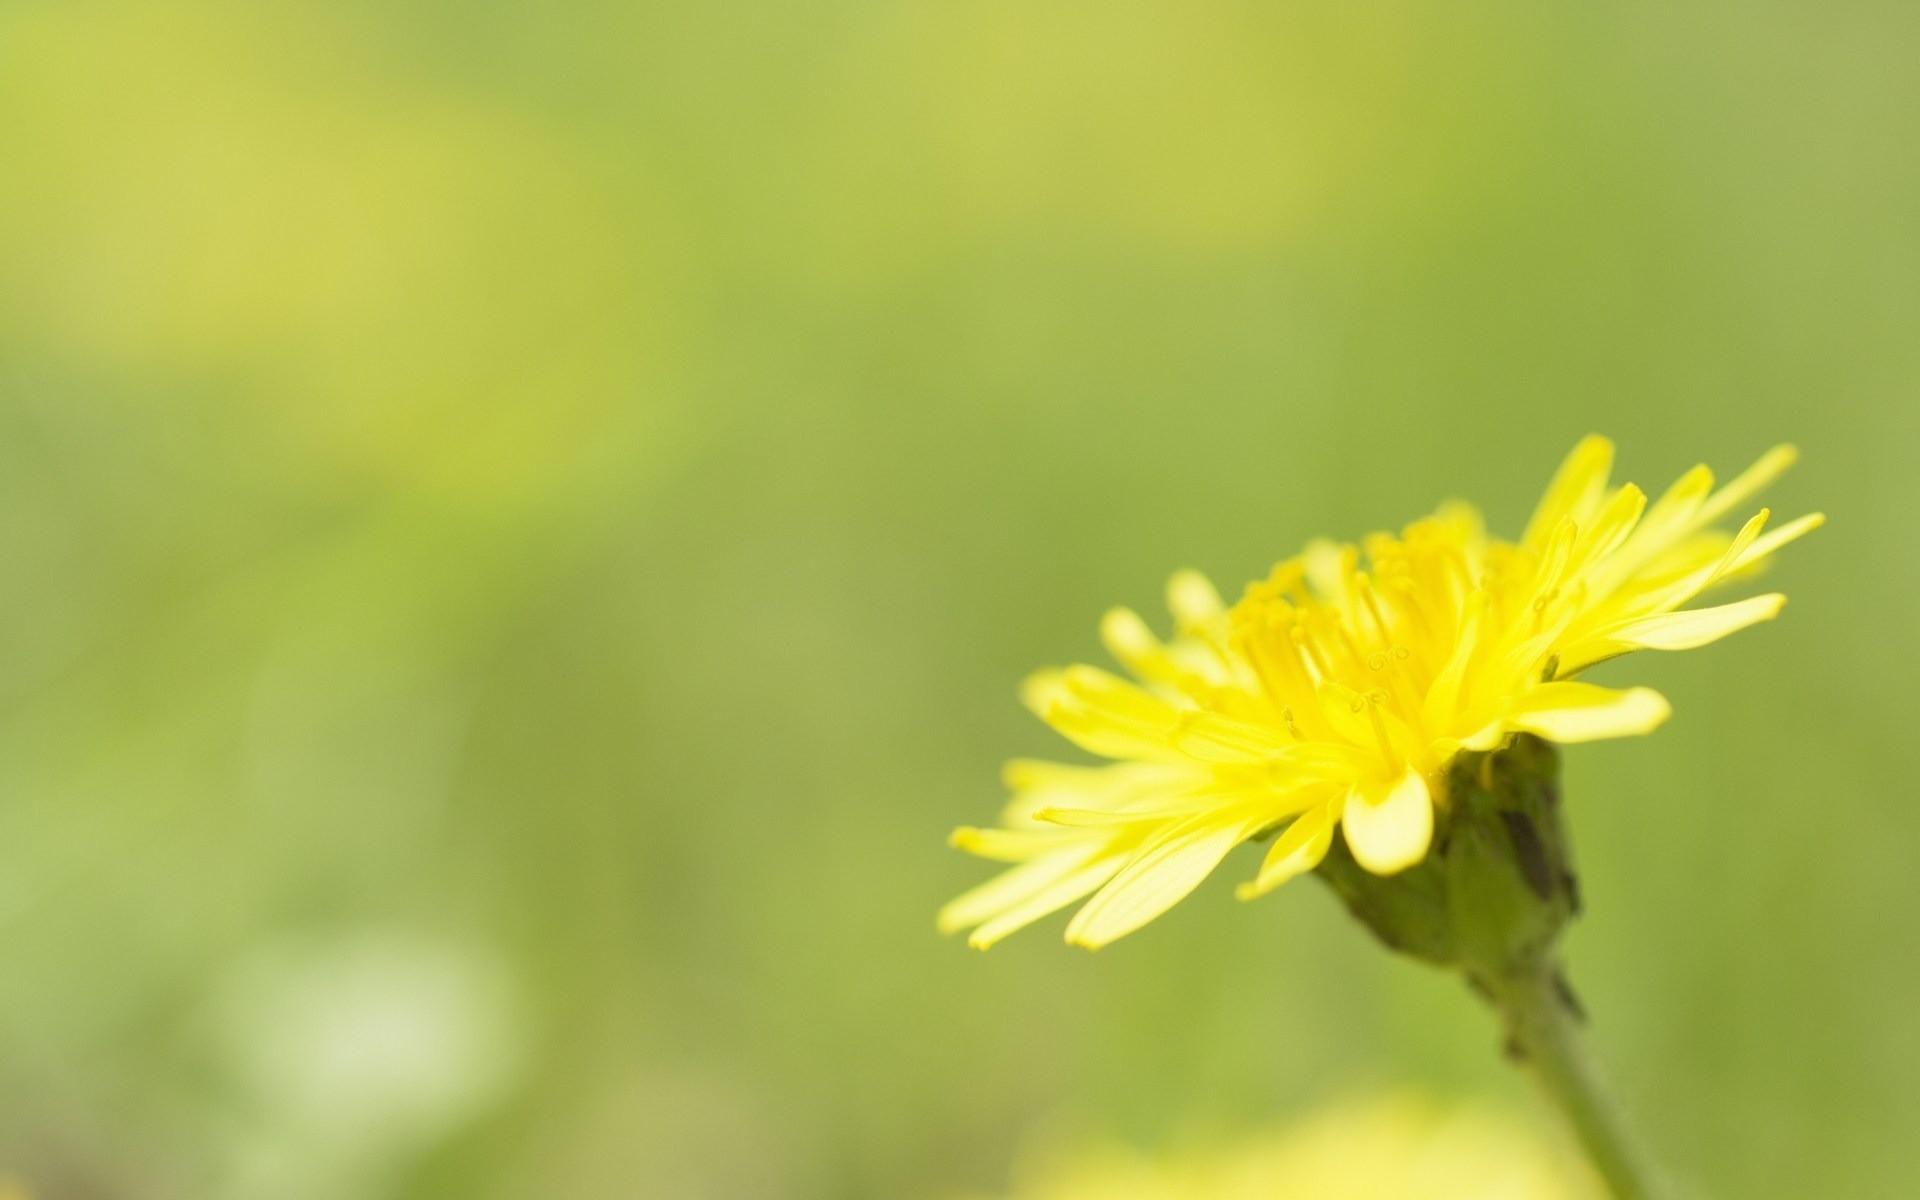 Yellow Dandelion Wallpaper Yellow Dandelion